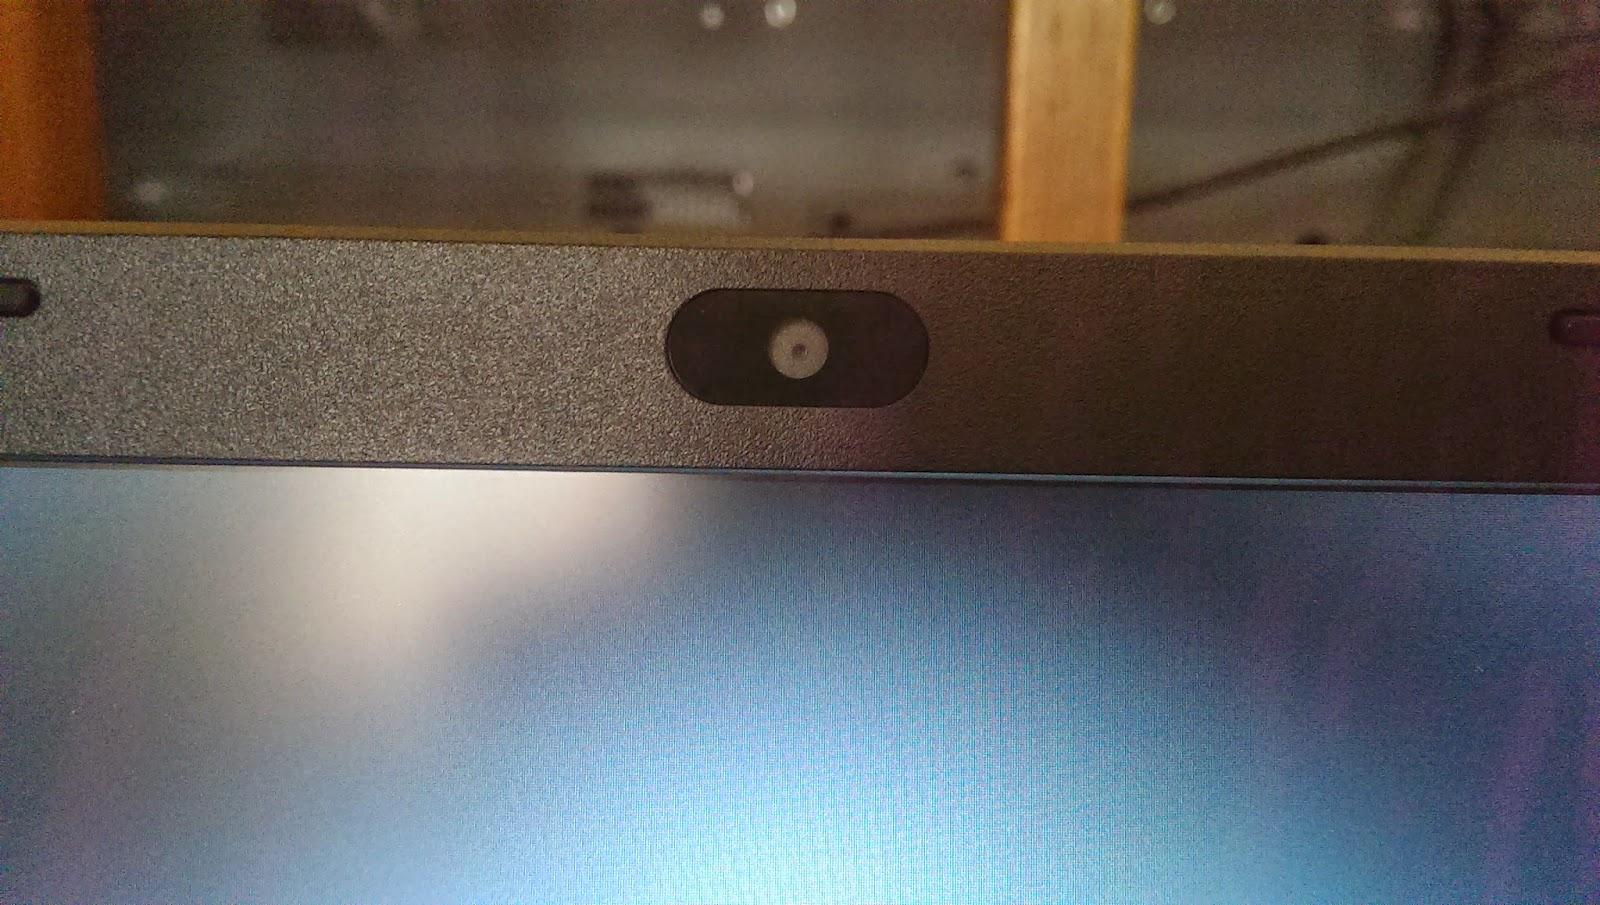 2015 03 22%2B12.23.53 - [開箱] Acer E5-572G i5-4210M 搭配NVIDIA 840G 2G獨顯